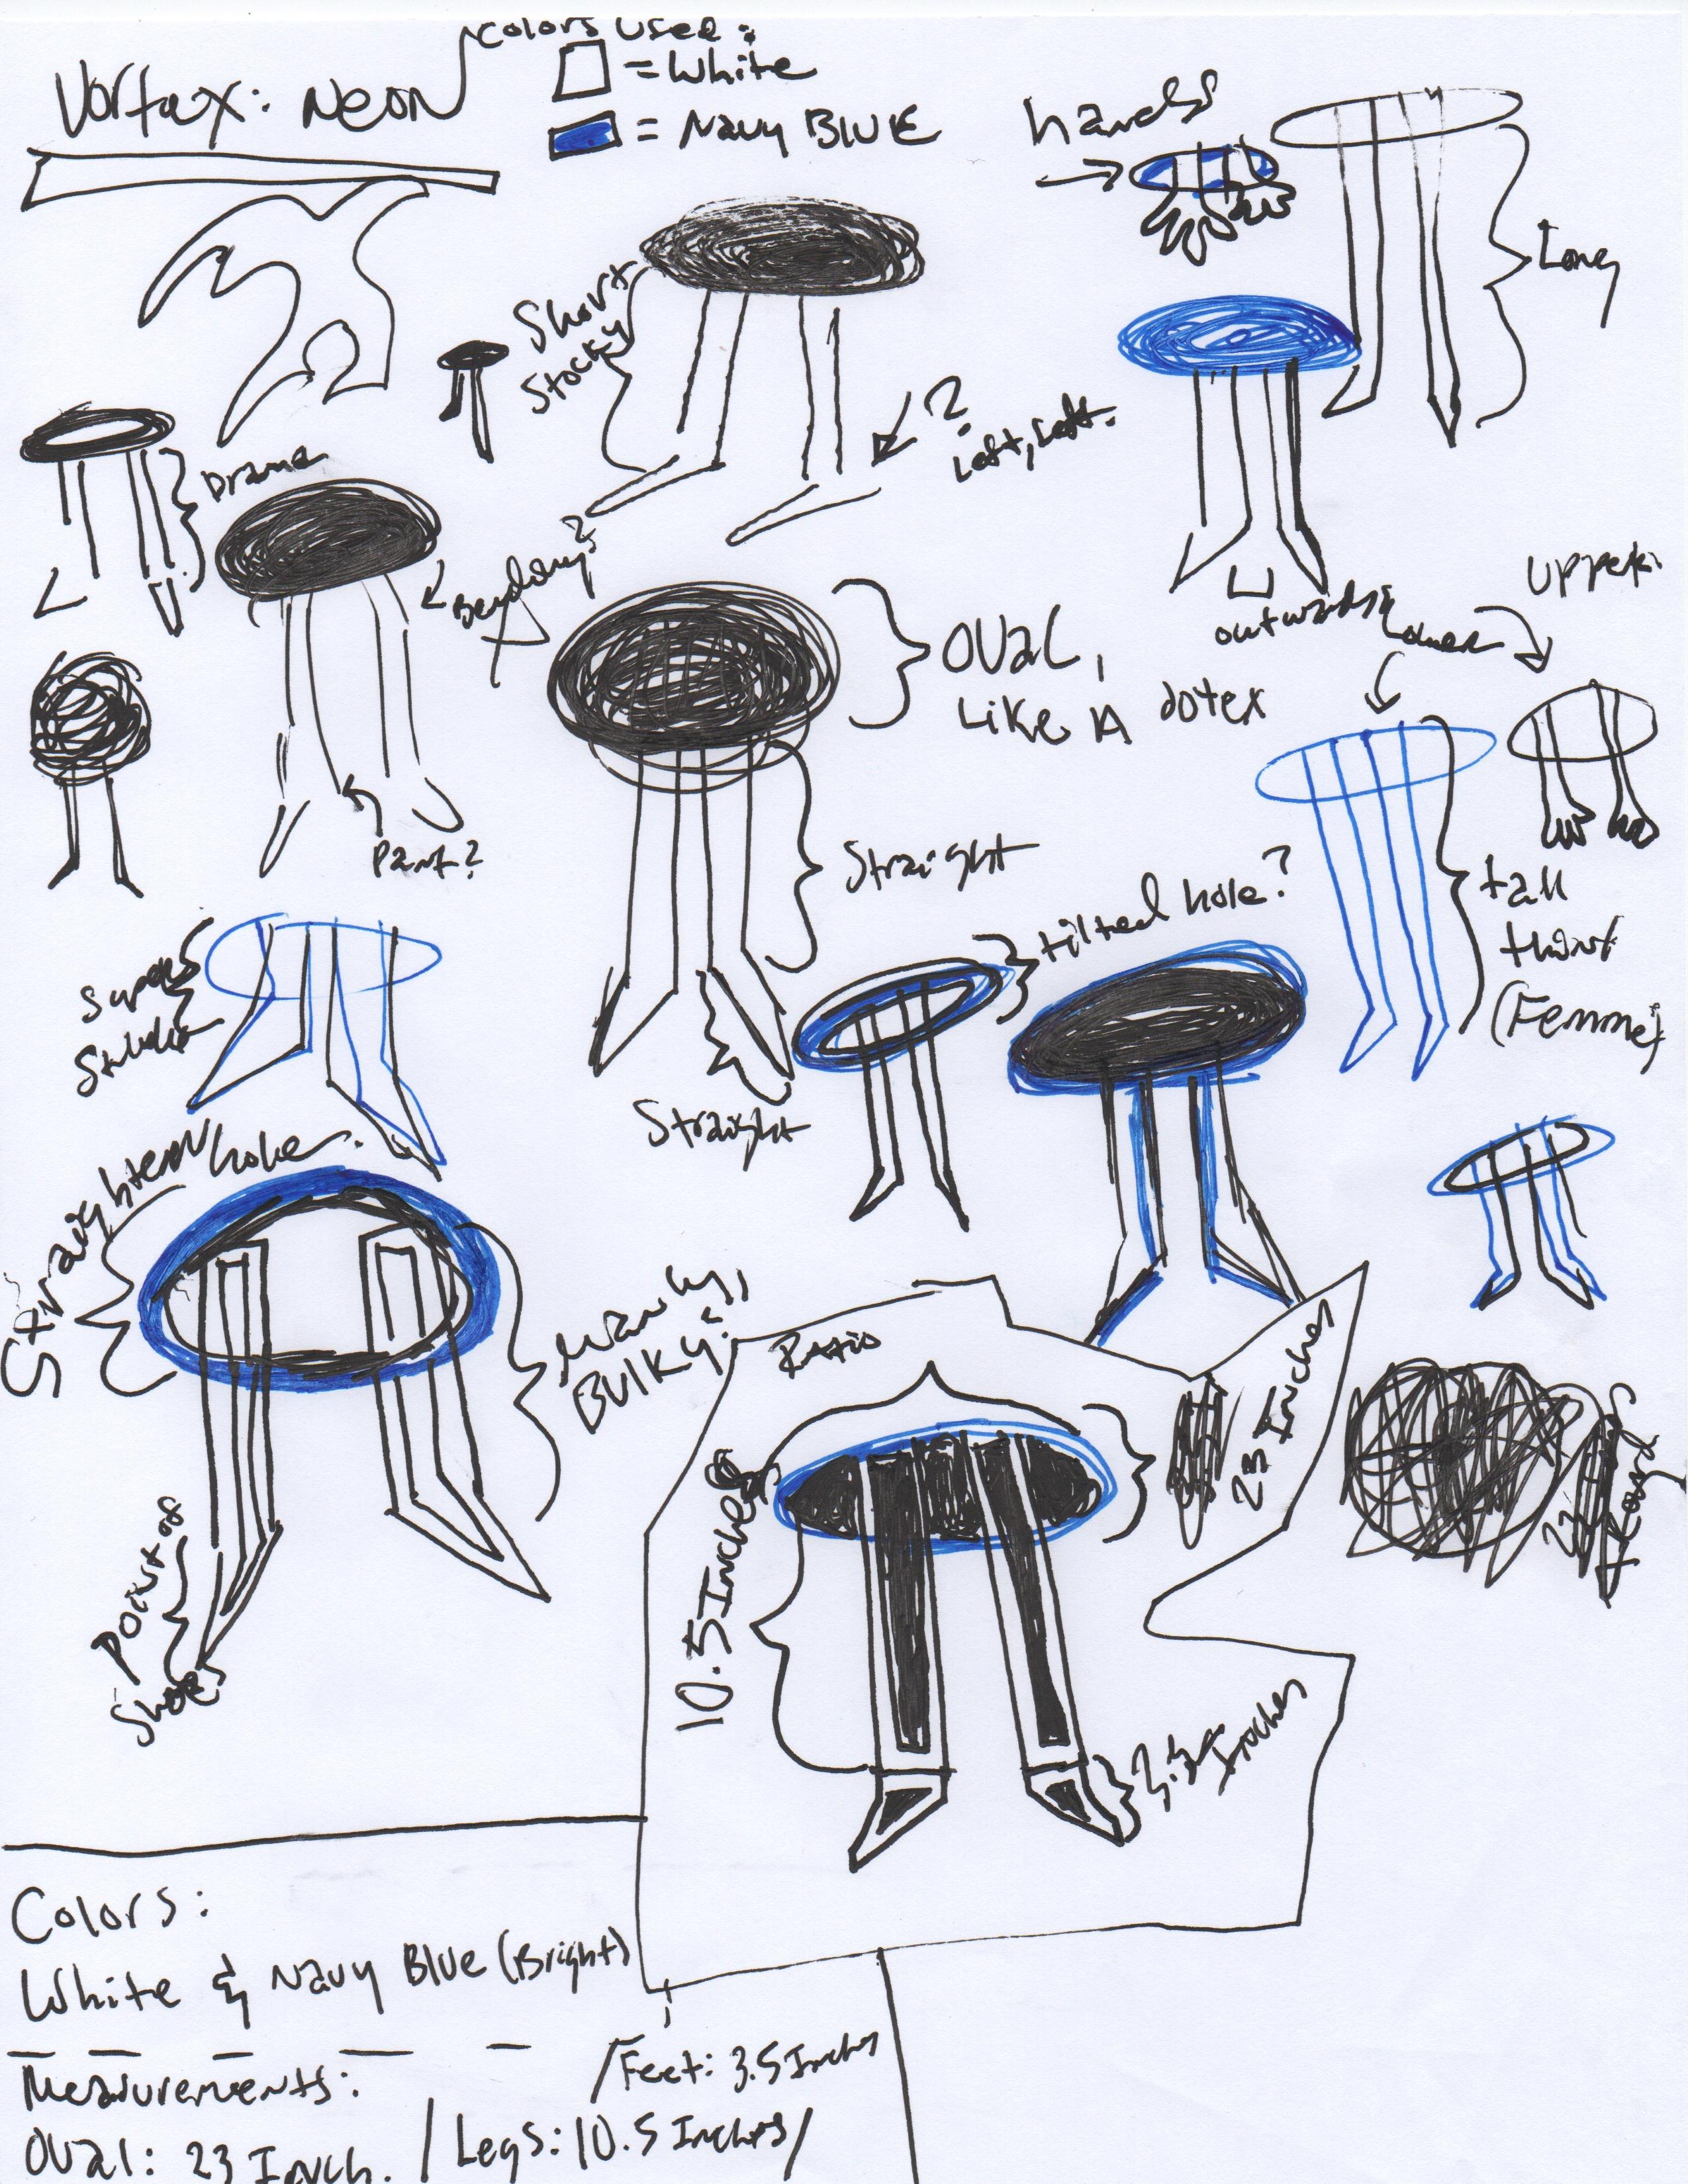 Sketches for Vortex (neon concept)